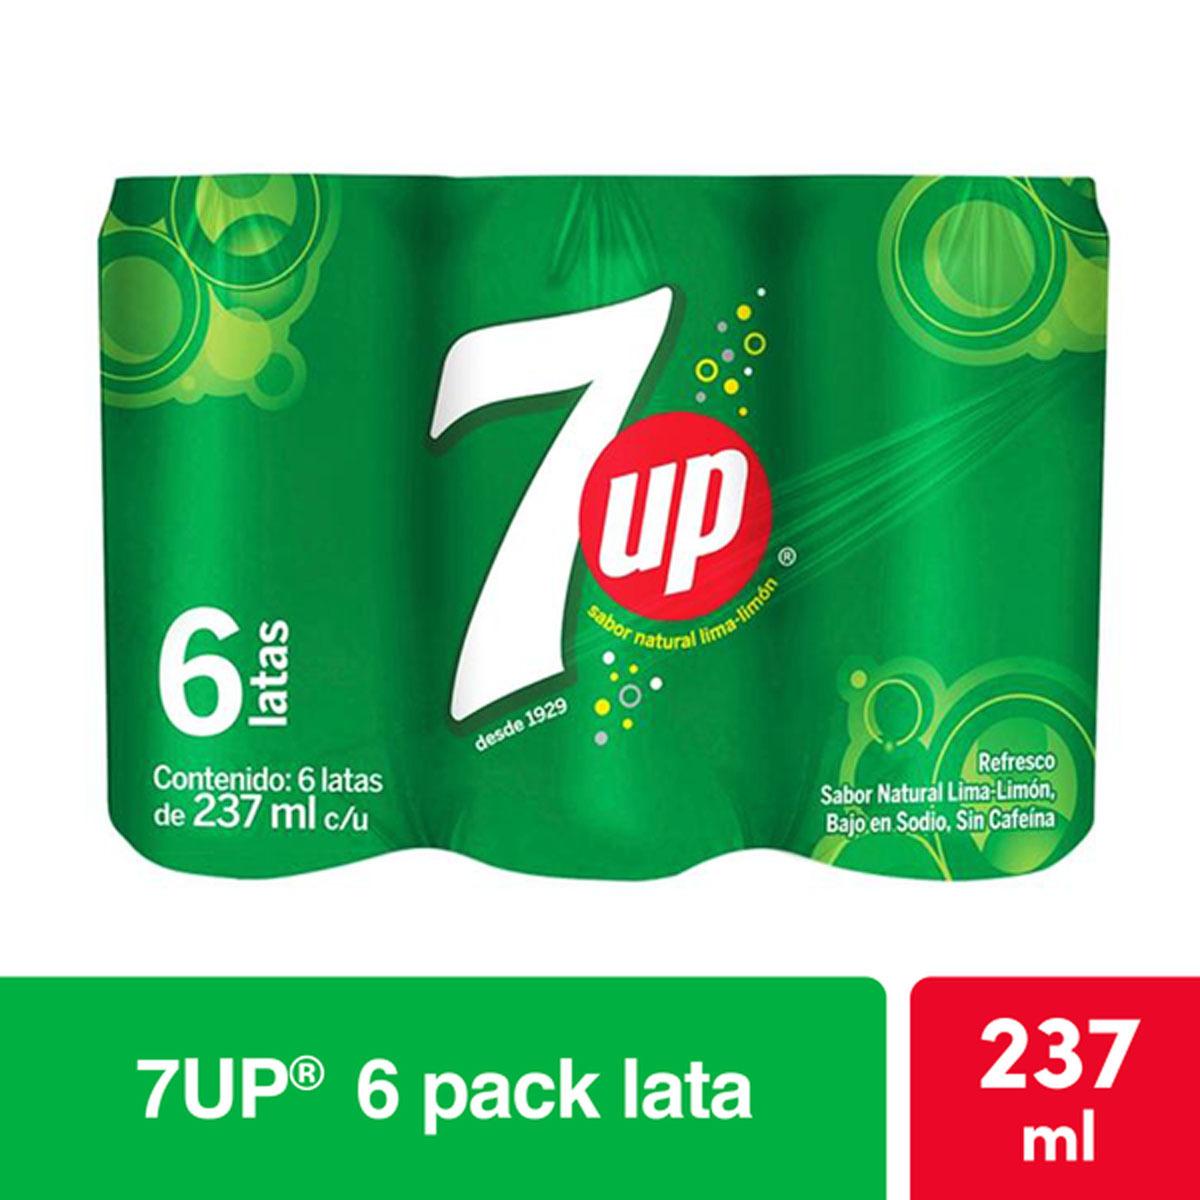 Chedraui: 7up 2x$70 Six pack Refrescos lata 237 ml